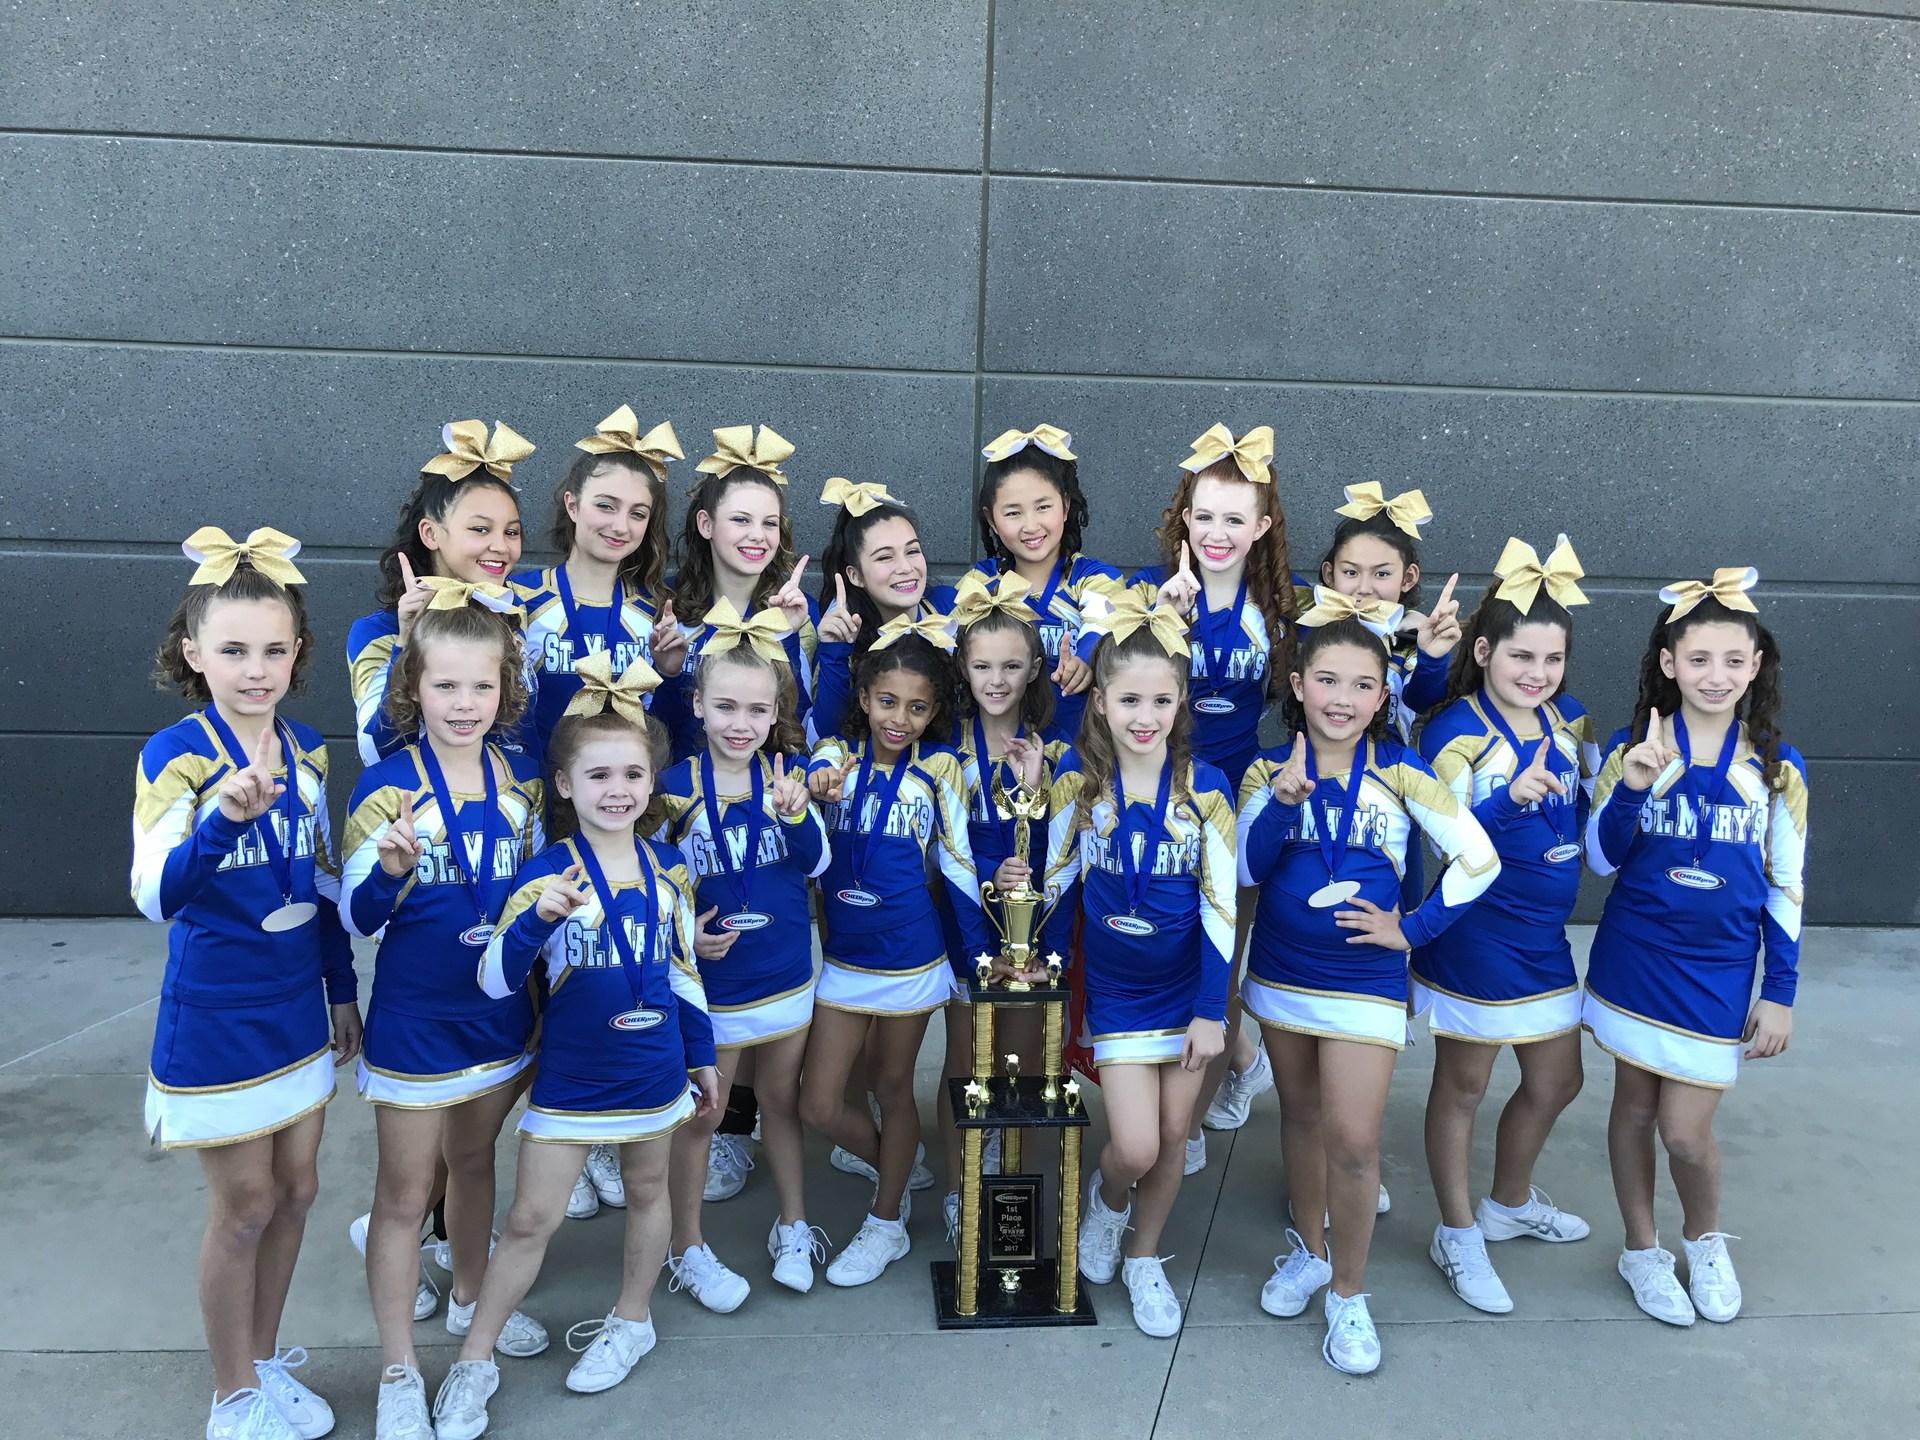 whole cheer team